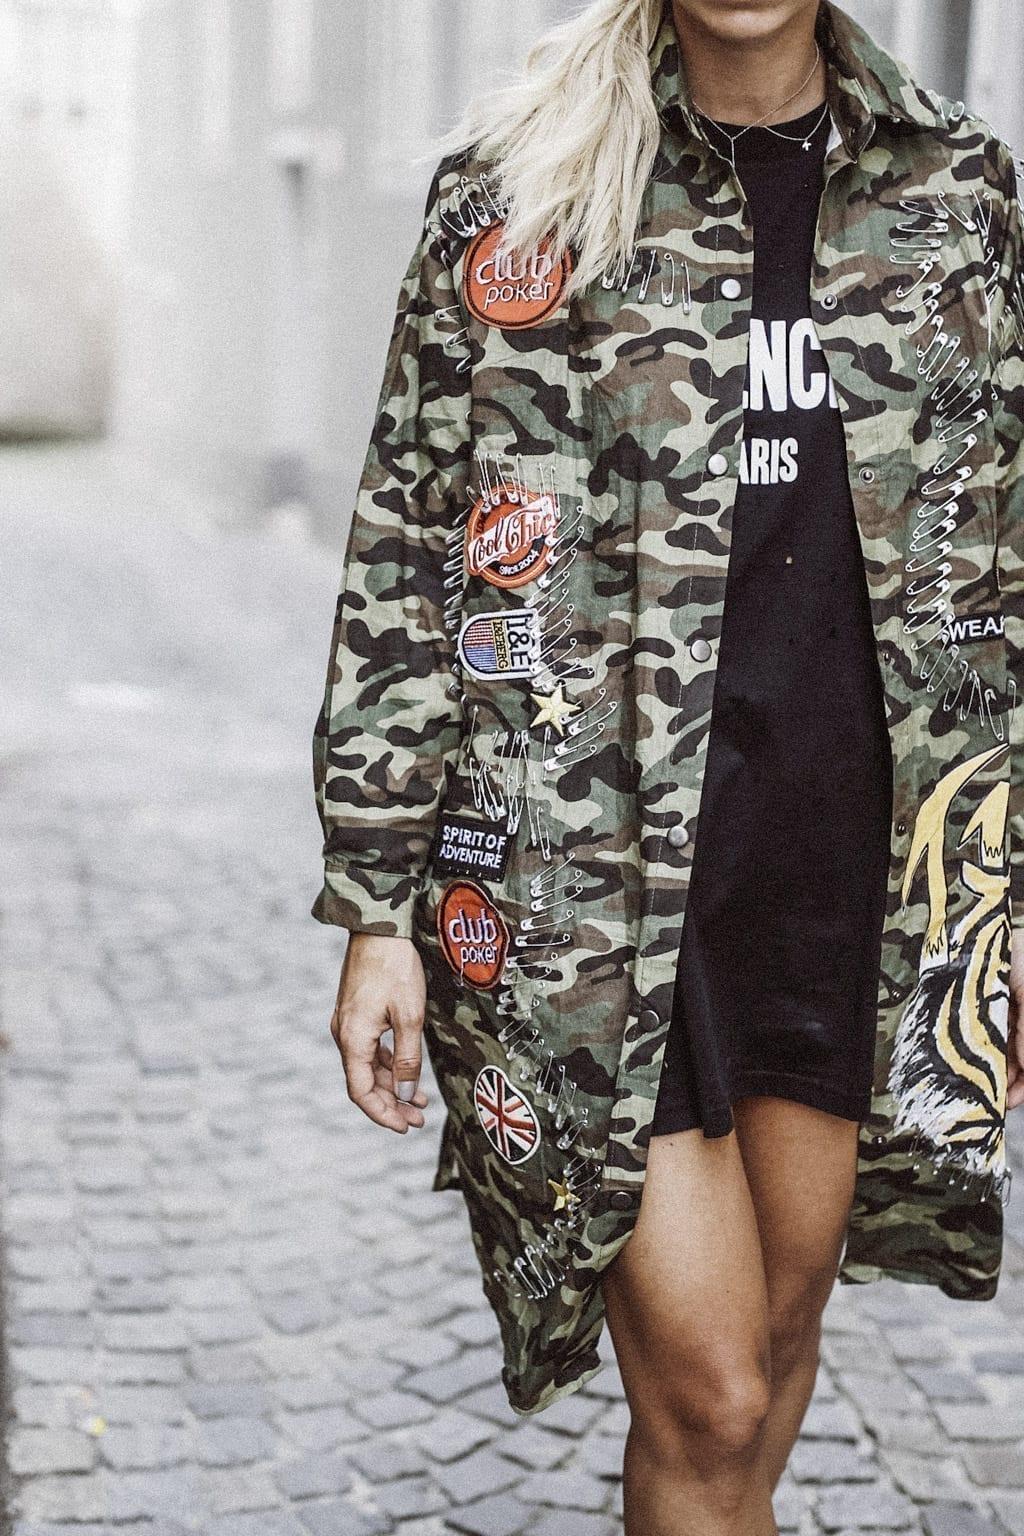 CK-1606_salzburg-fashion-street-style-look-magazine-karin-kaswurm-electric-love-2016-festival-camouflage-military-jacket-8962